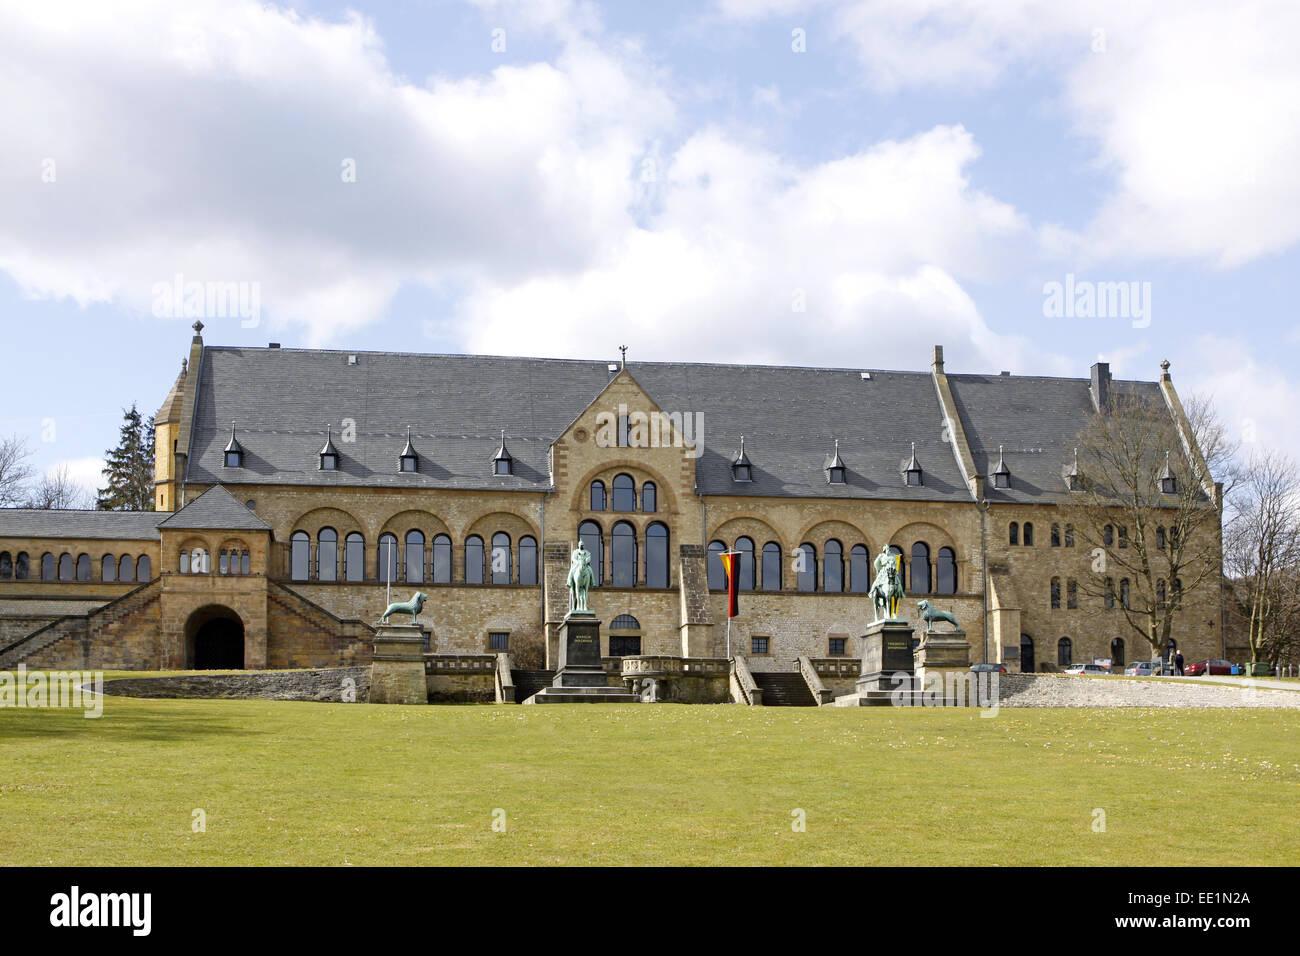 Altstadt, Architektur, Bauwerk, Bauwerke, Deutschland, Fassade, Fassaden, Gebaeude, Goslar, Kaiser, Kaiserpfalz, - Stock Image